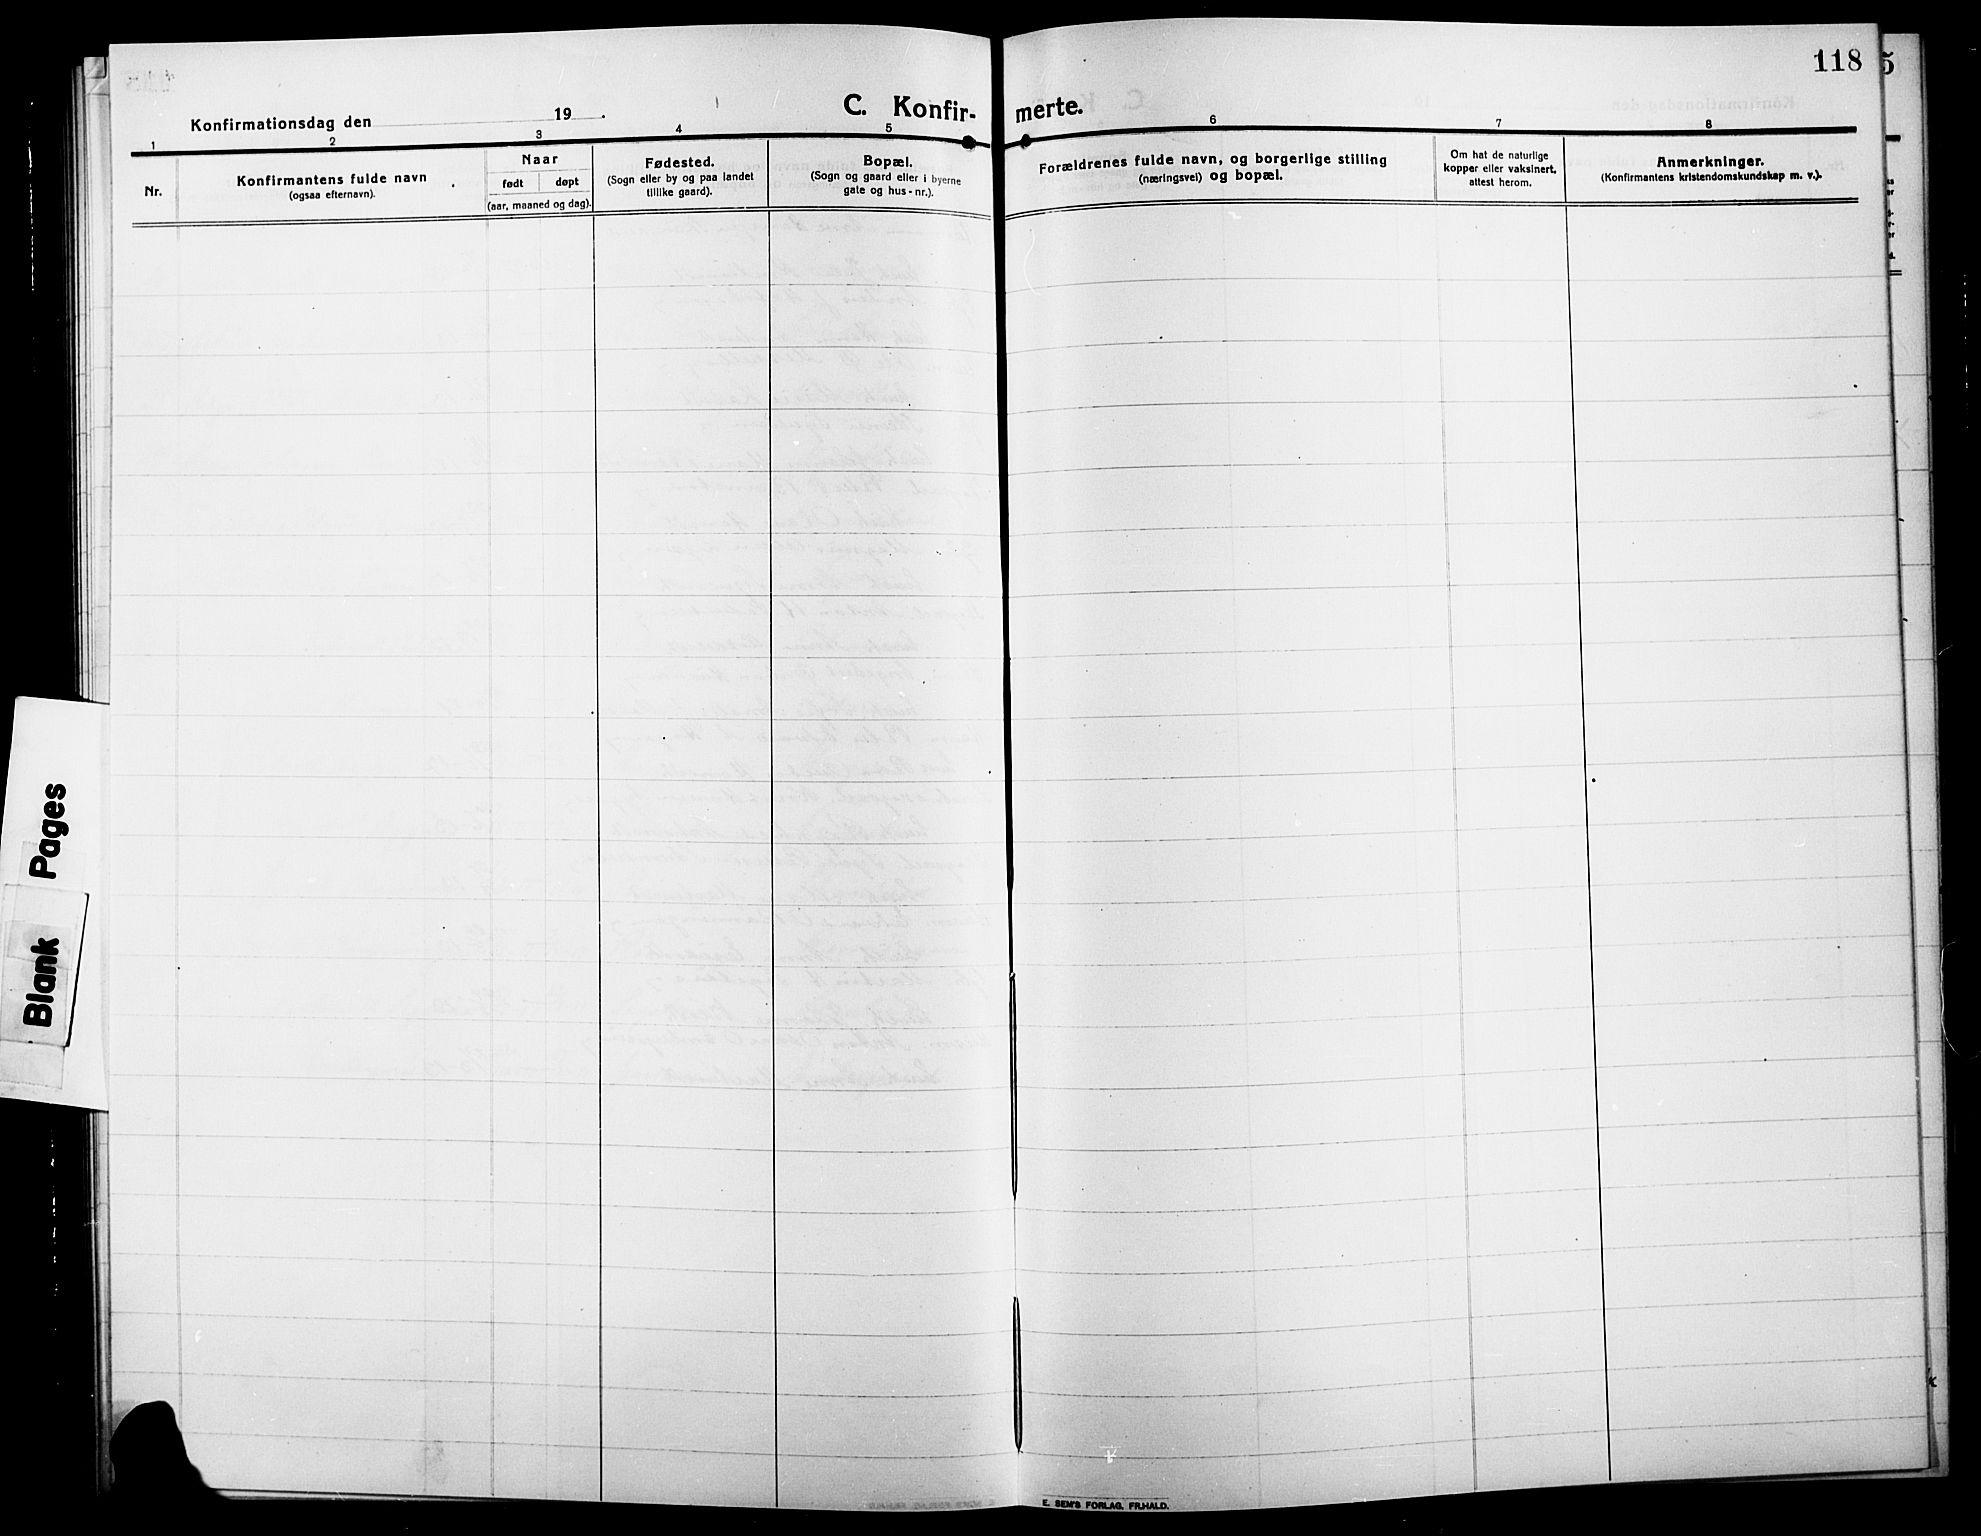 SAH, Søndre Land prestekontor, L/L0006: Klokkerbok nr. 6, 1912-1925, s. 118